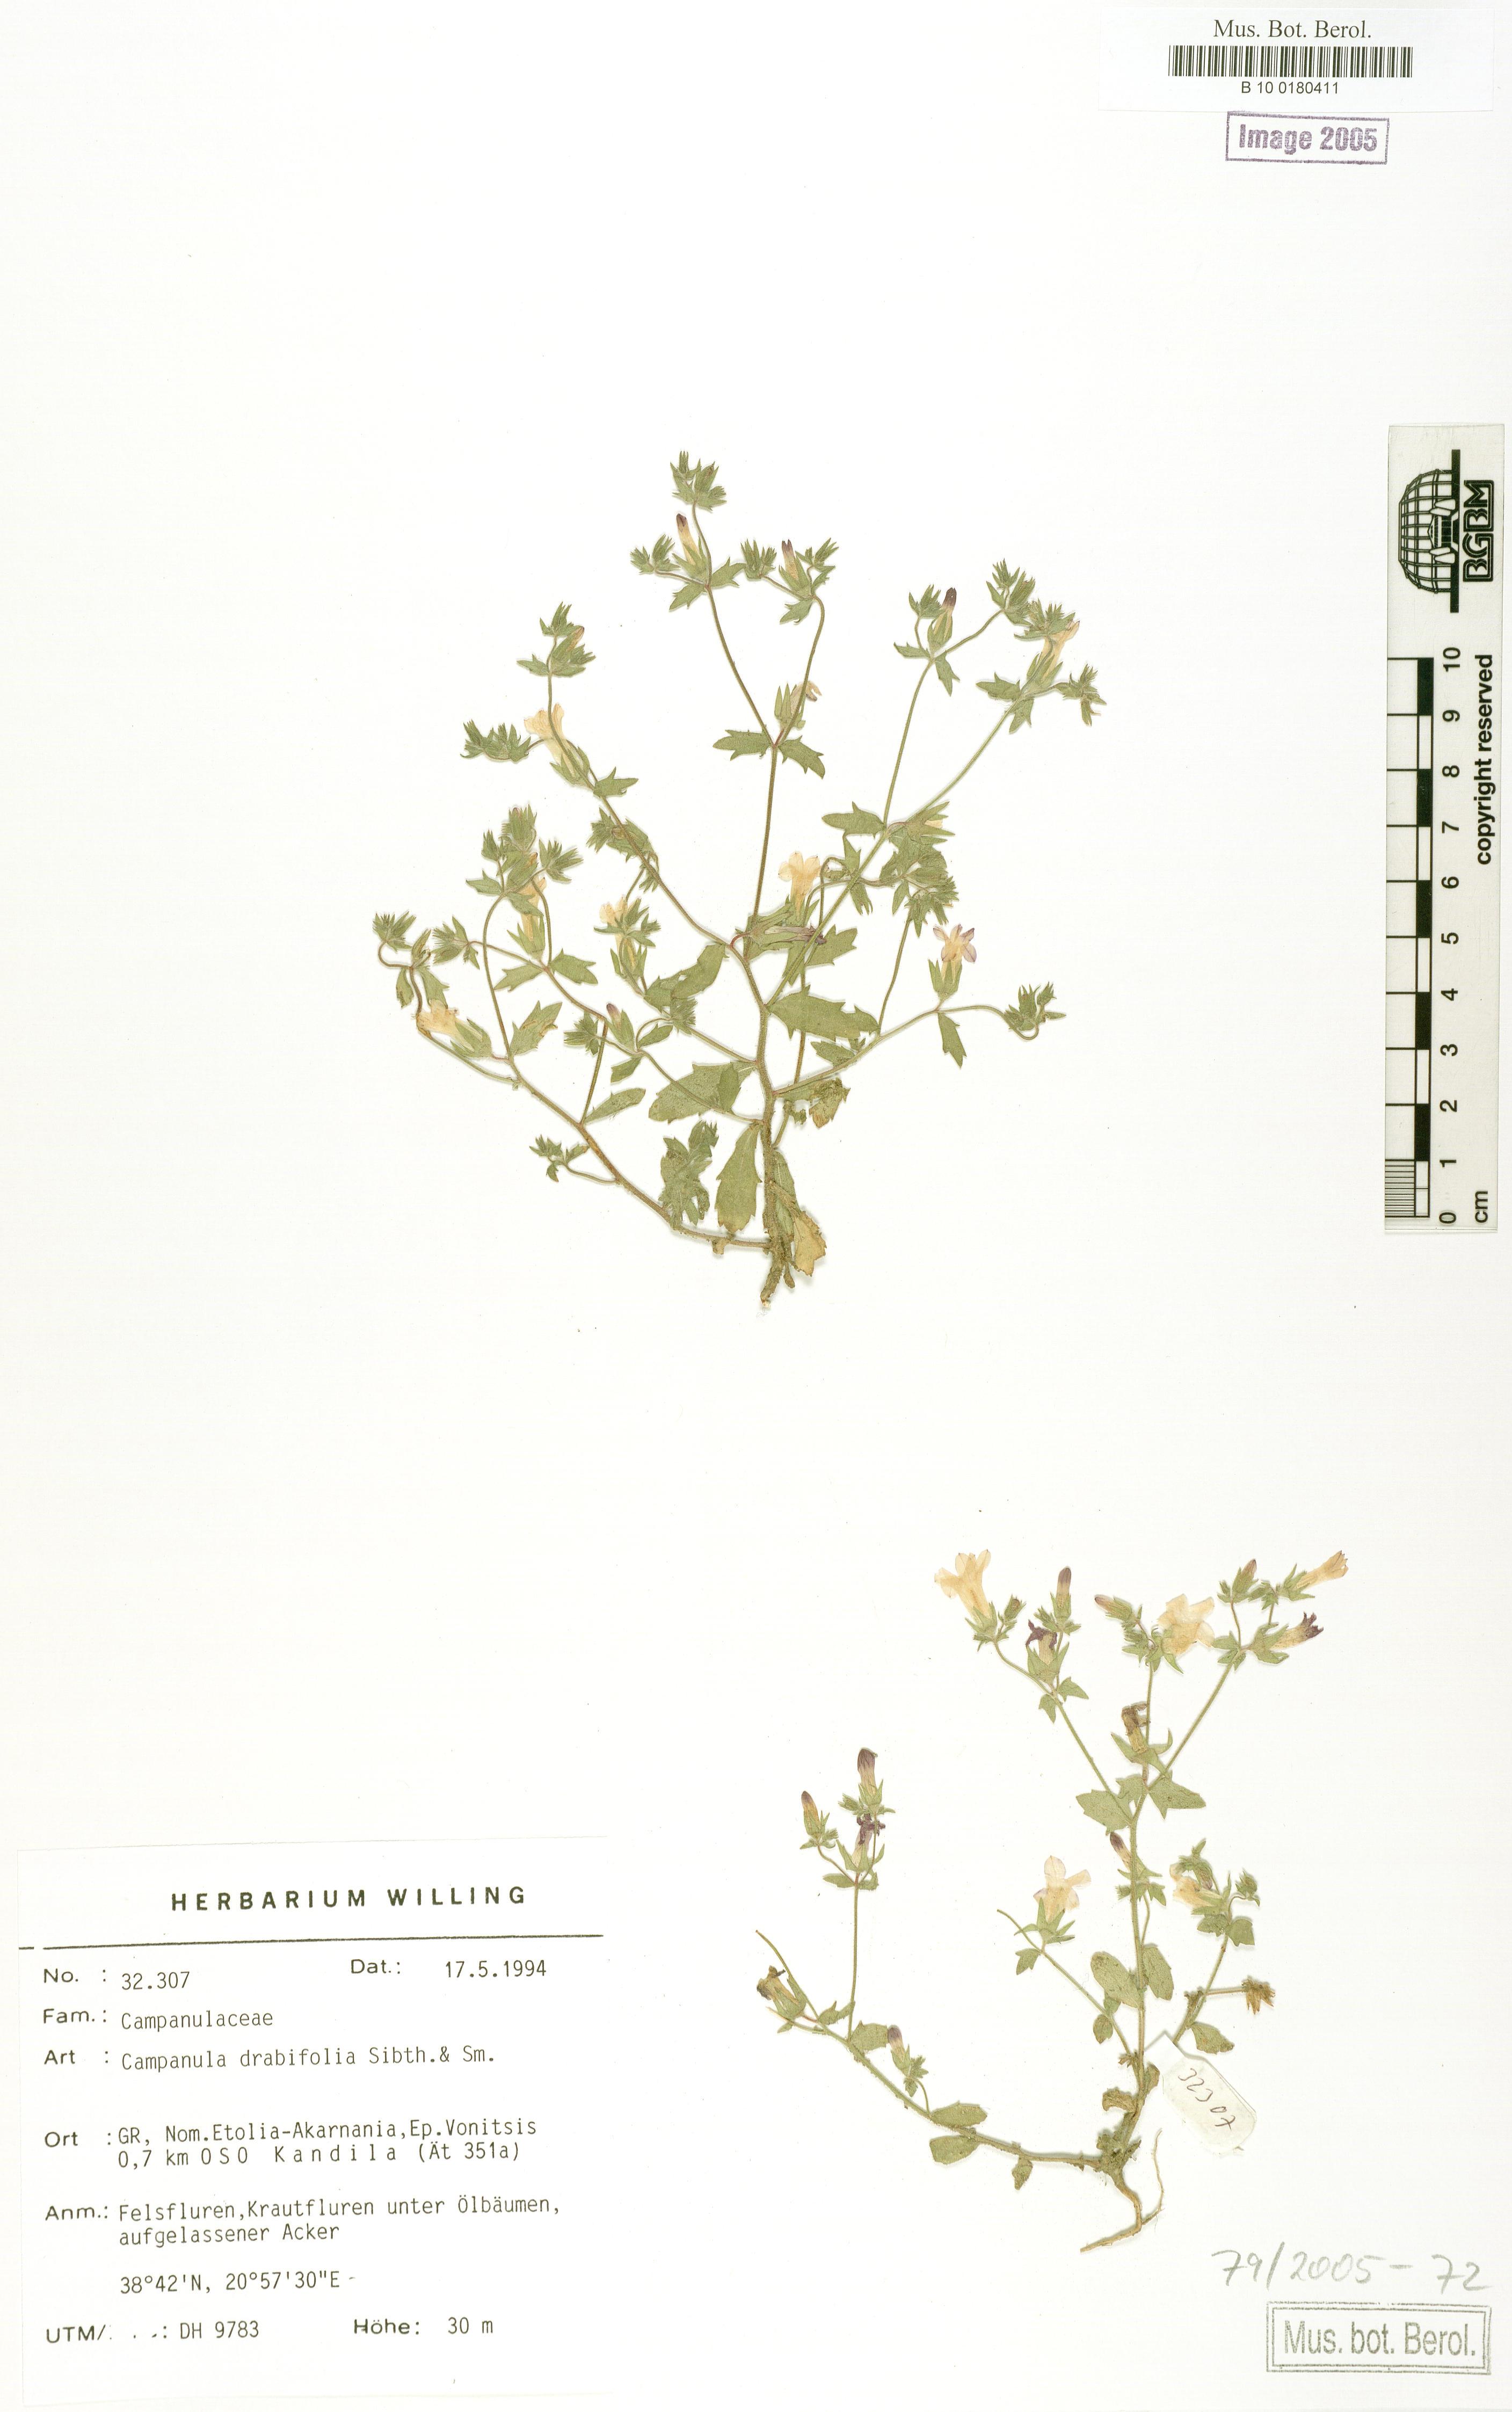 http://ww2.bgbm.org/herbarium/images/B/10/01/80/41/B_10_0180411.jpg